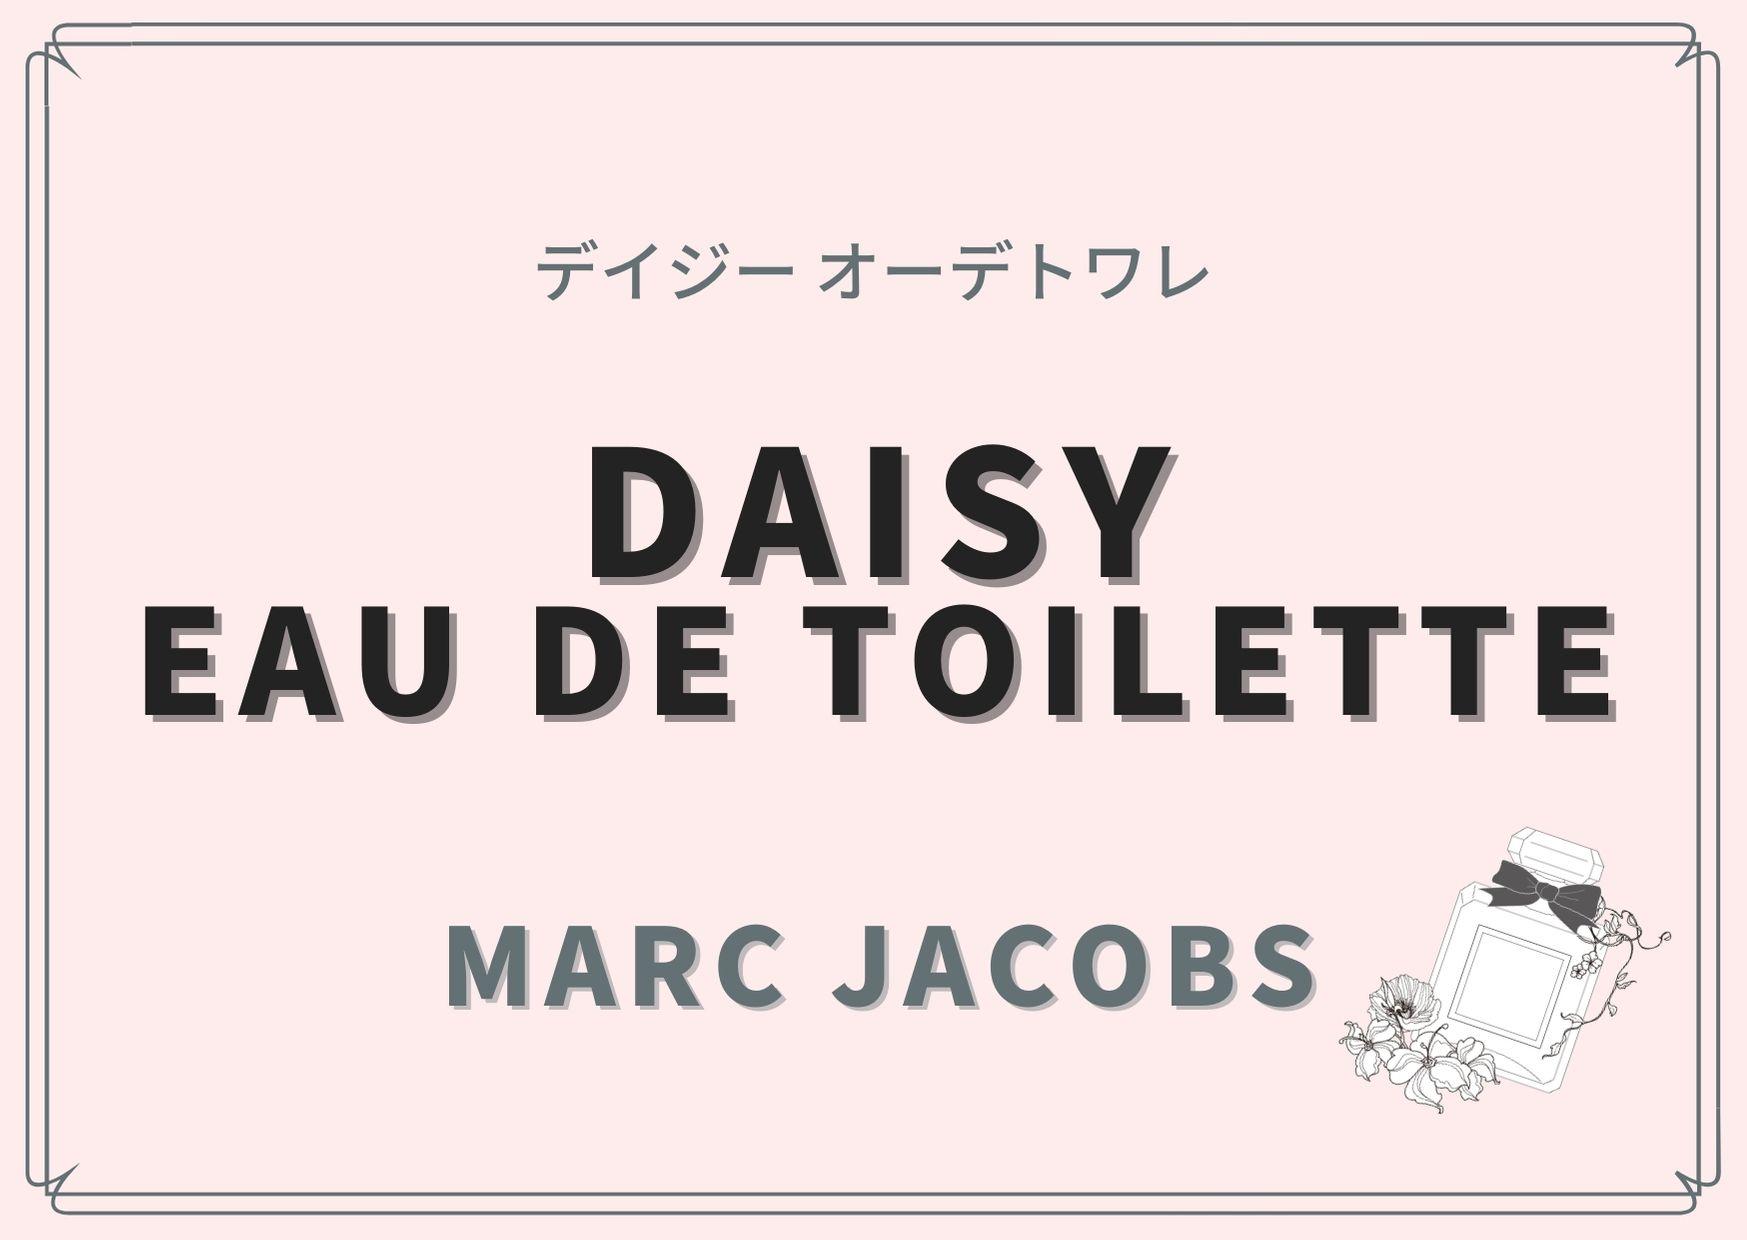 DAISY EAU DE TOILETTE(デイジー オーデトワレ)/MARC JACOBS(マークジェイコブス)